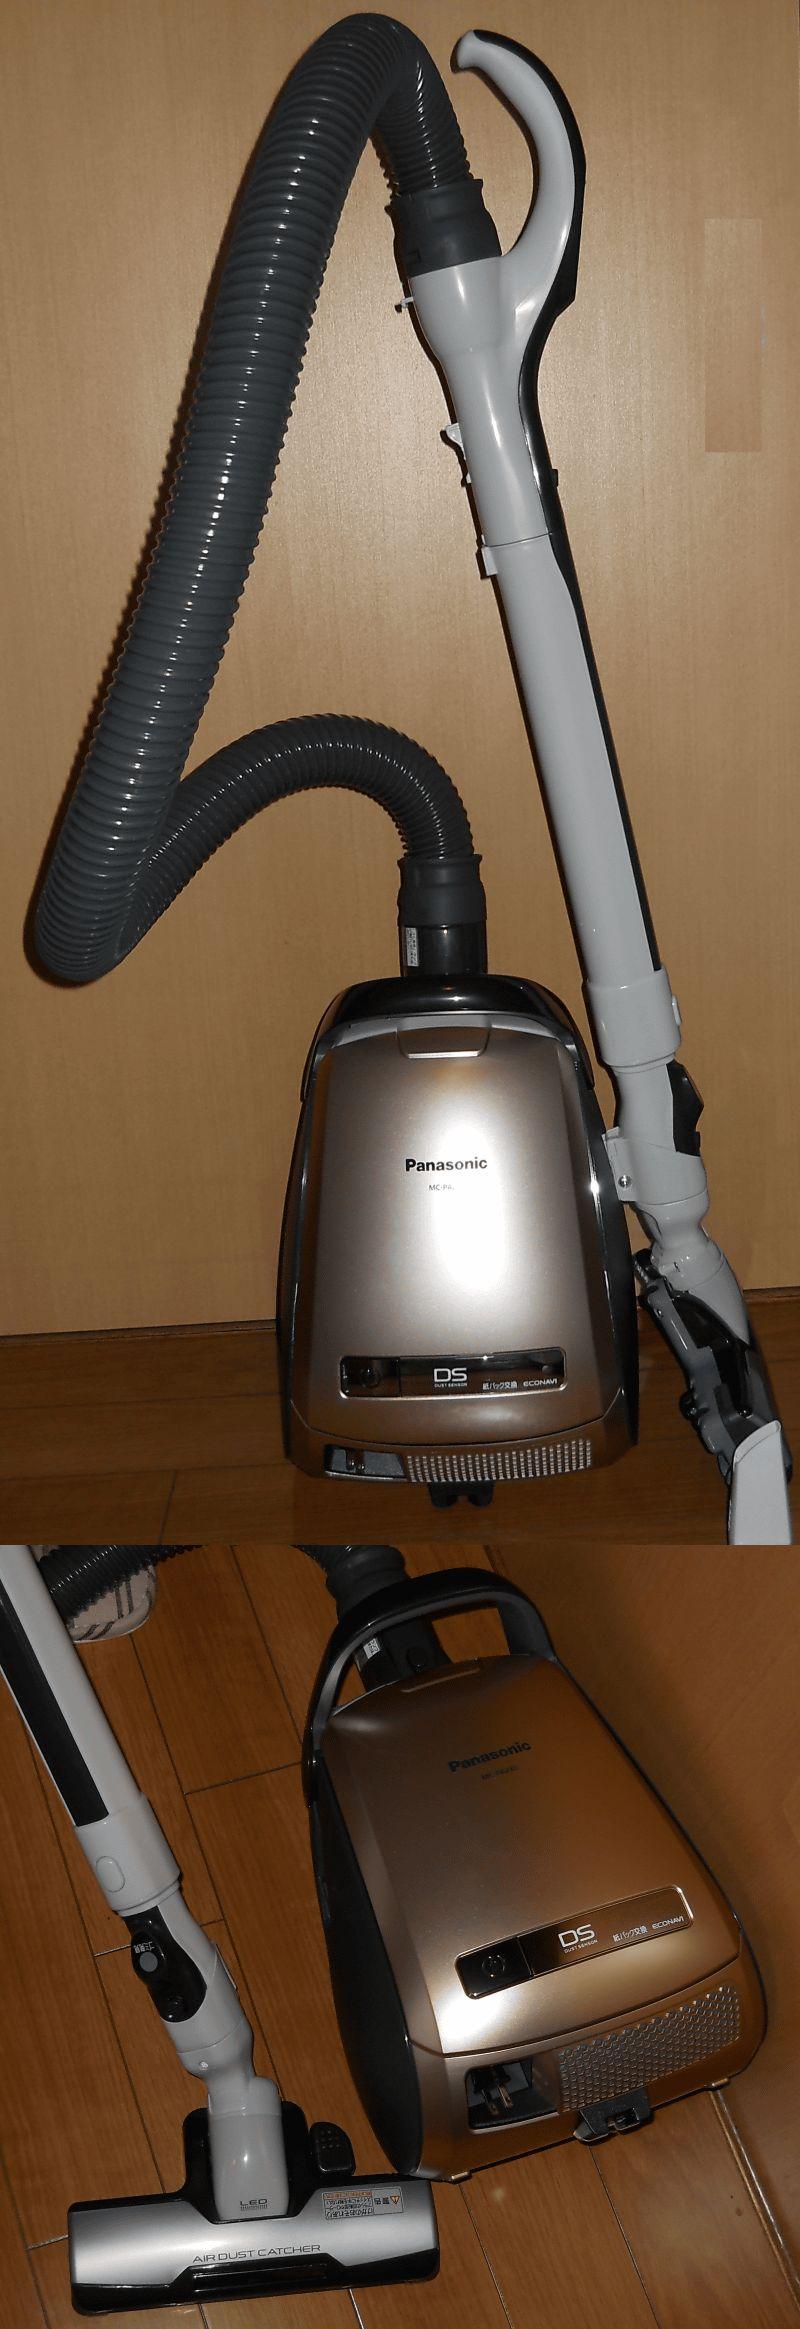 Panasonic_MC-PA23G-P_001.jpg